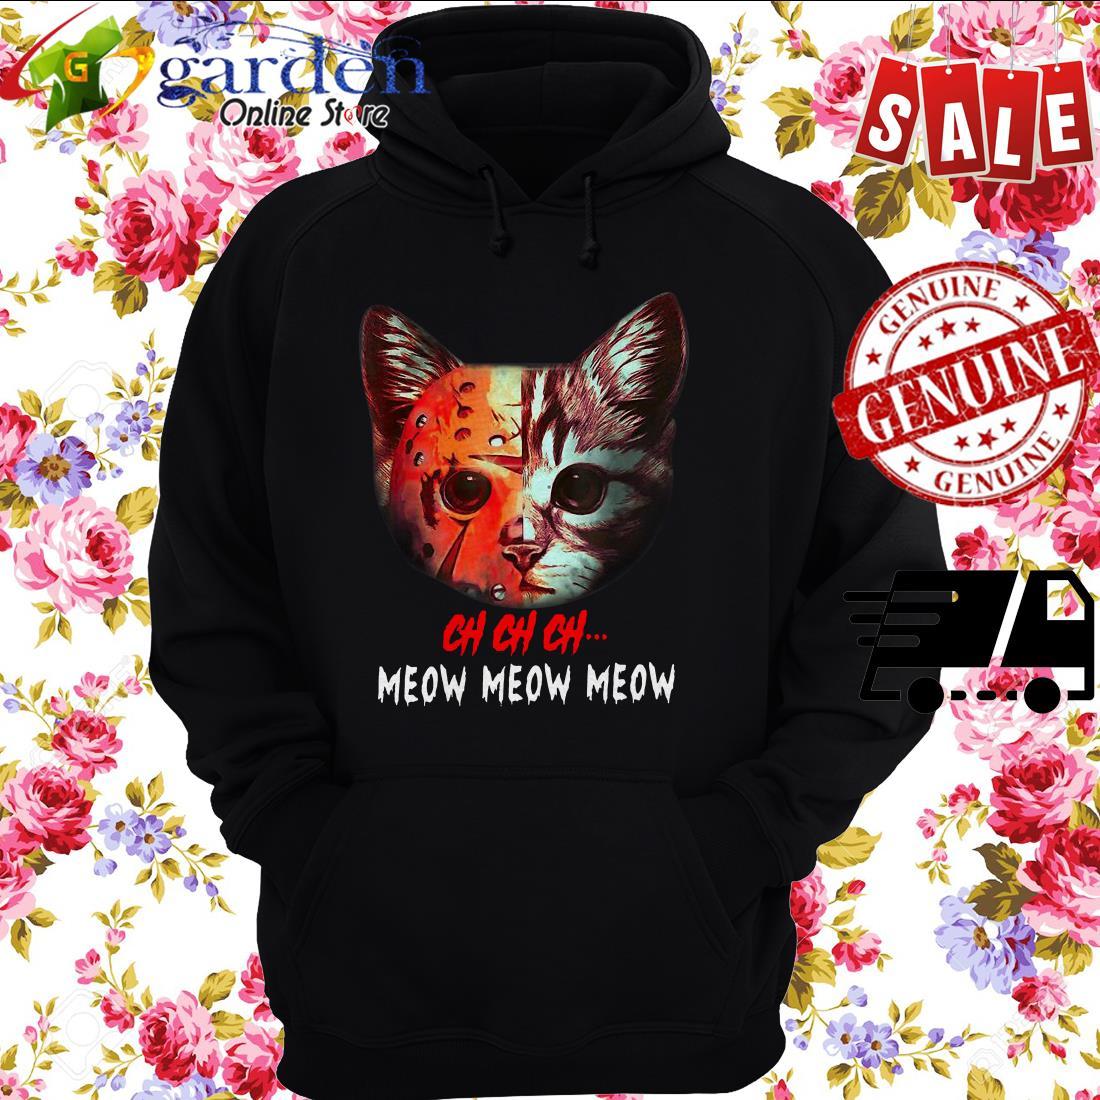 Jason Voorhees Cat Ch Ch Ch Grr Grr Grr hoodie